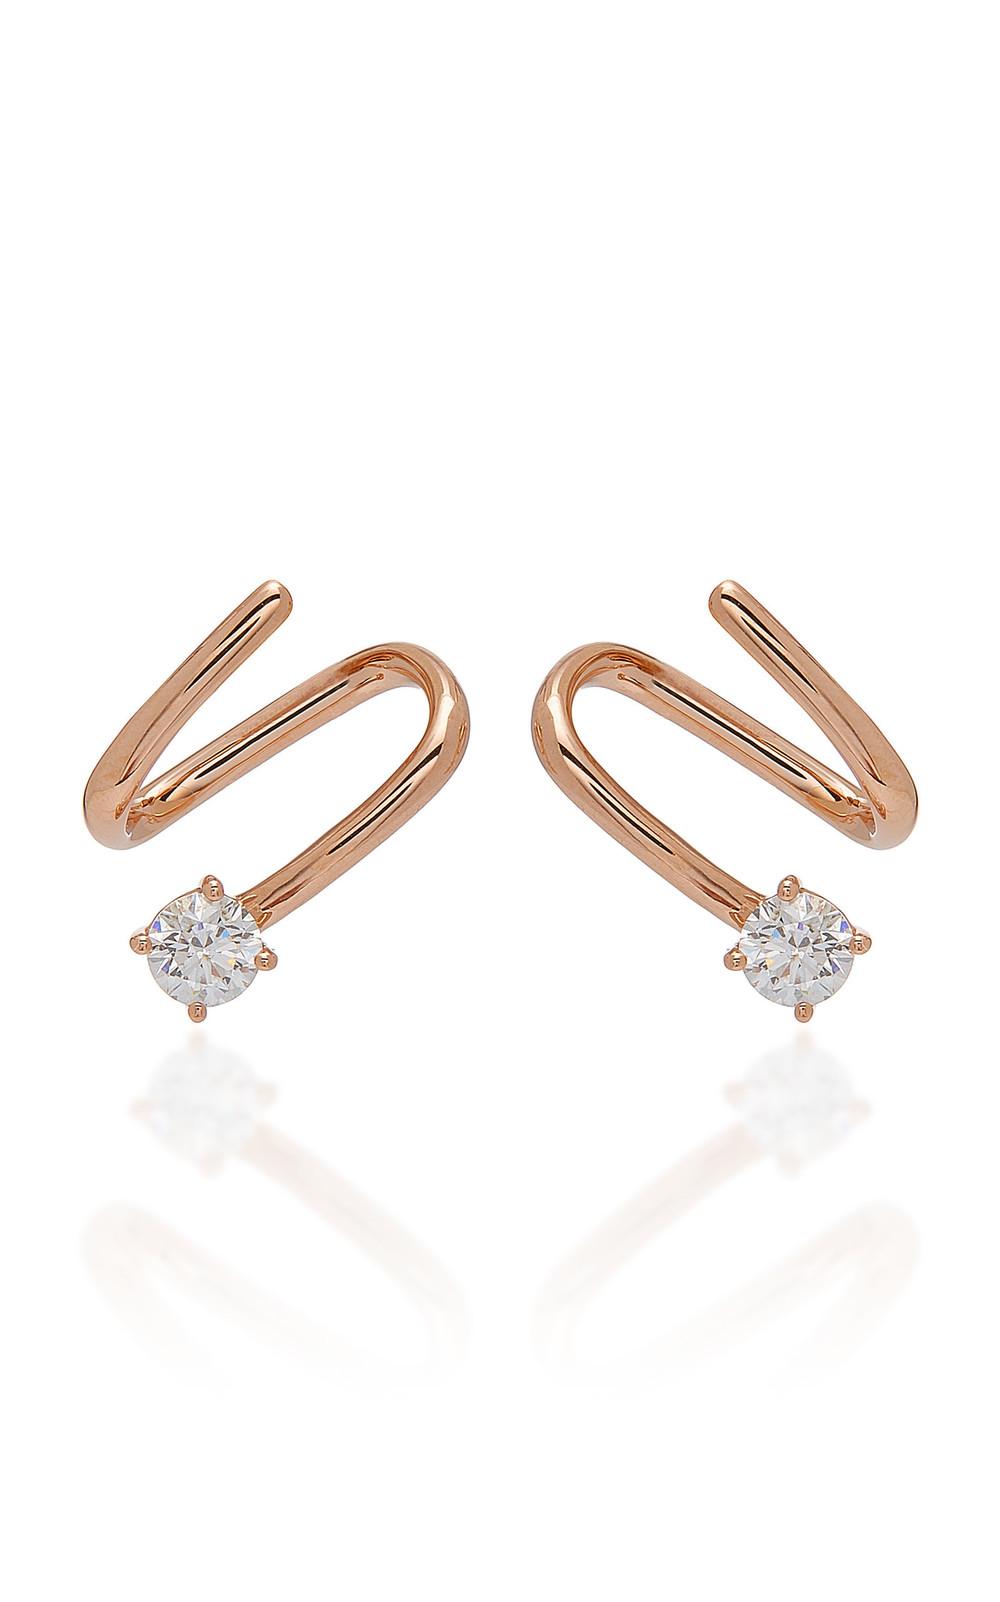 Anita Ko 18K Gold And Diamond Coil Earrings in pink